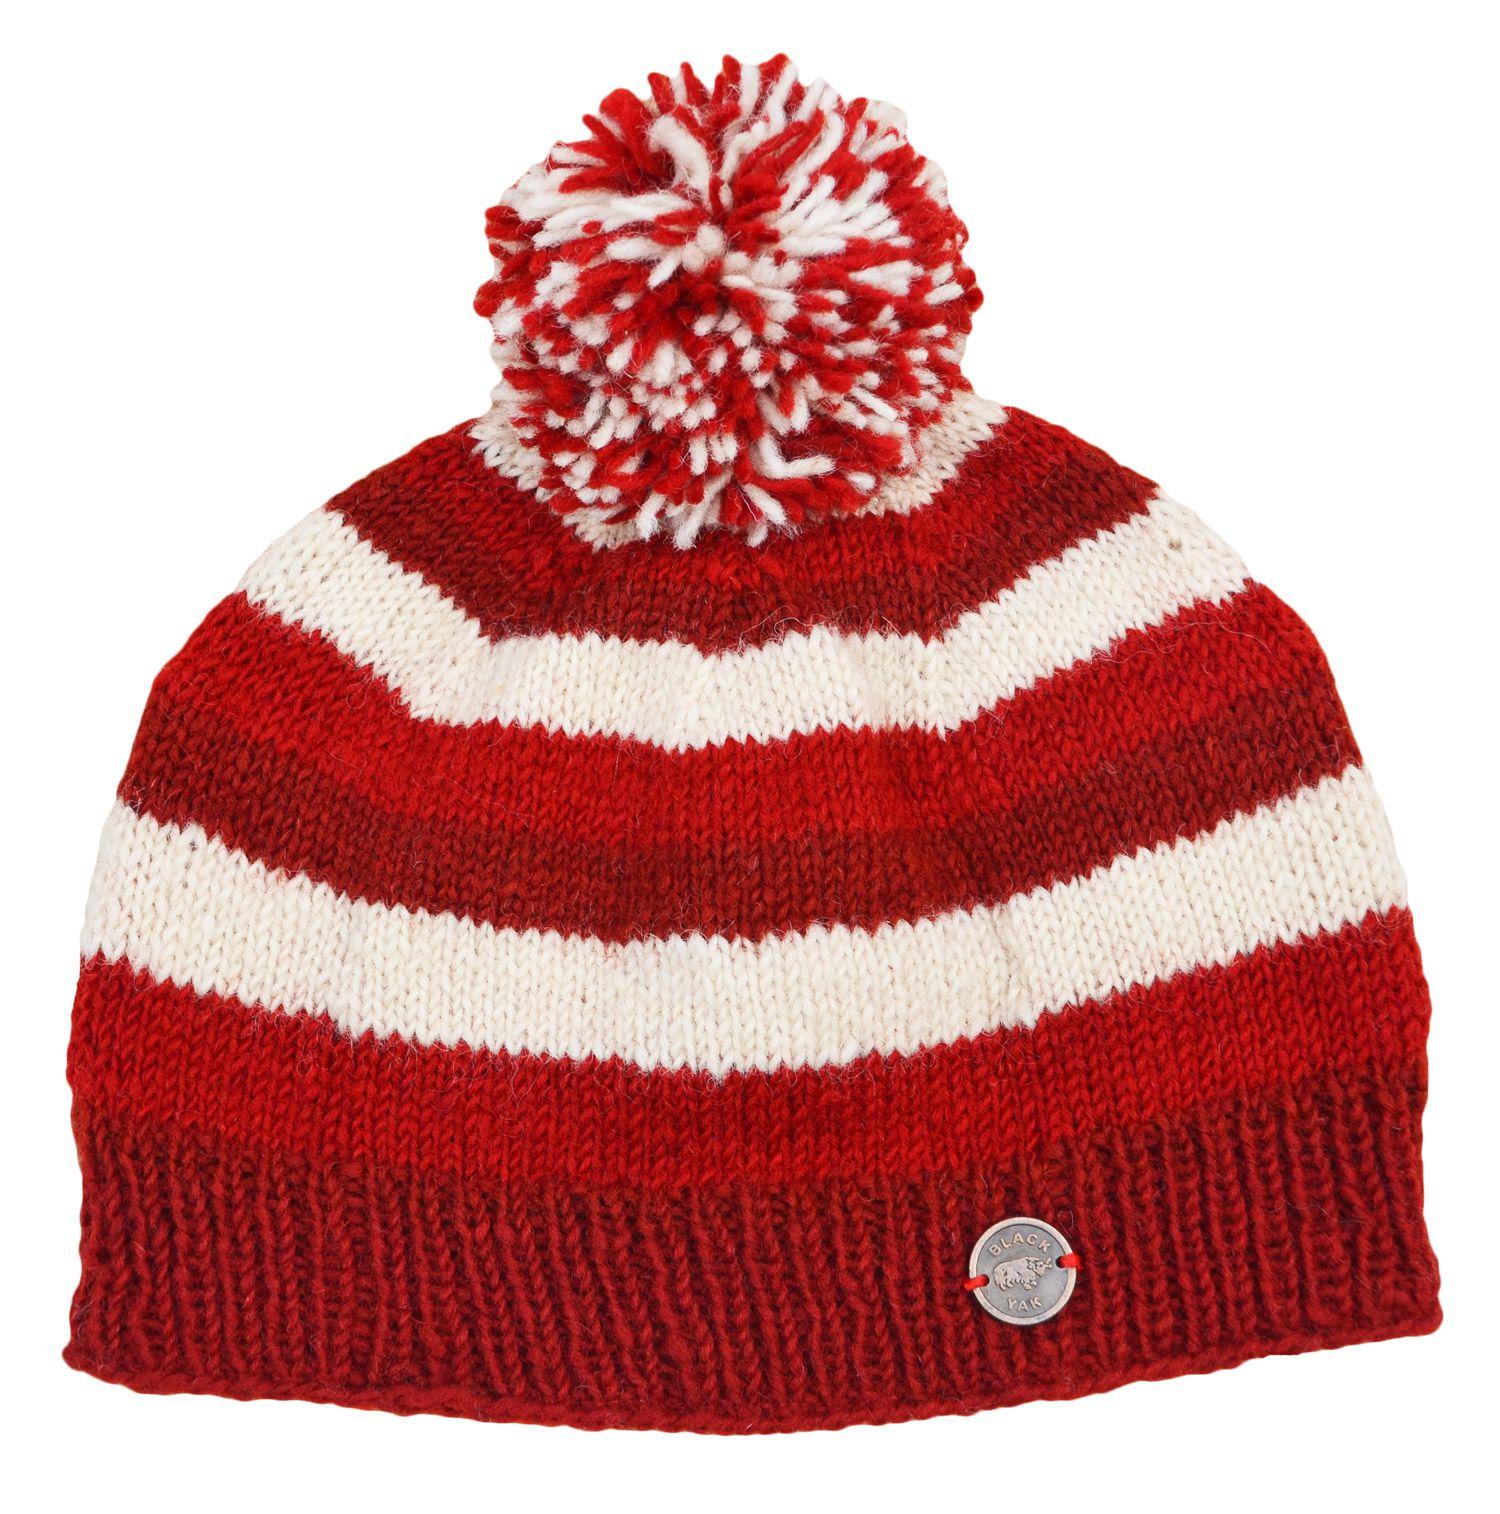 d5dc331de69e76 Pure wool - hand knit - single knit - bobble hat - Red/cream   Black Yak